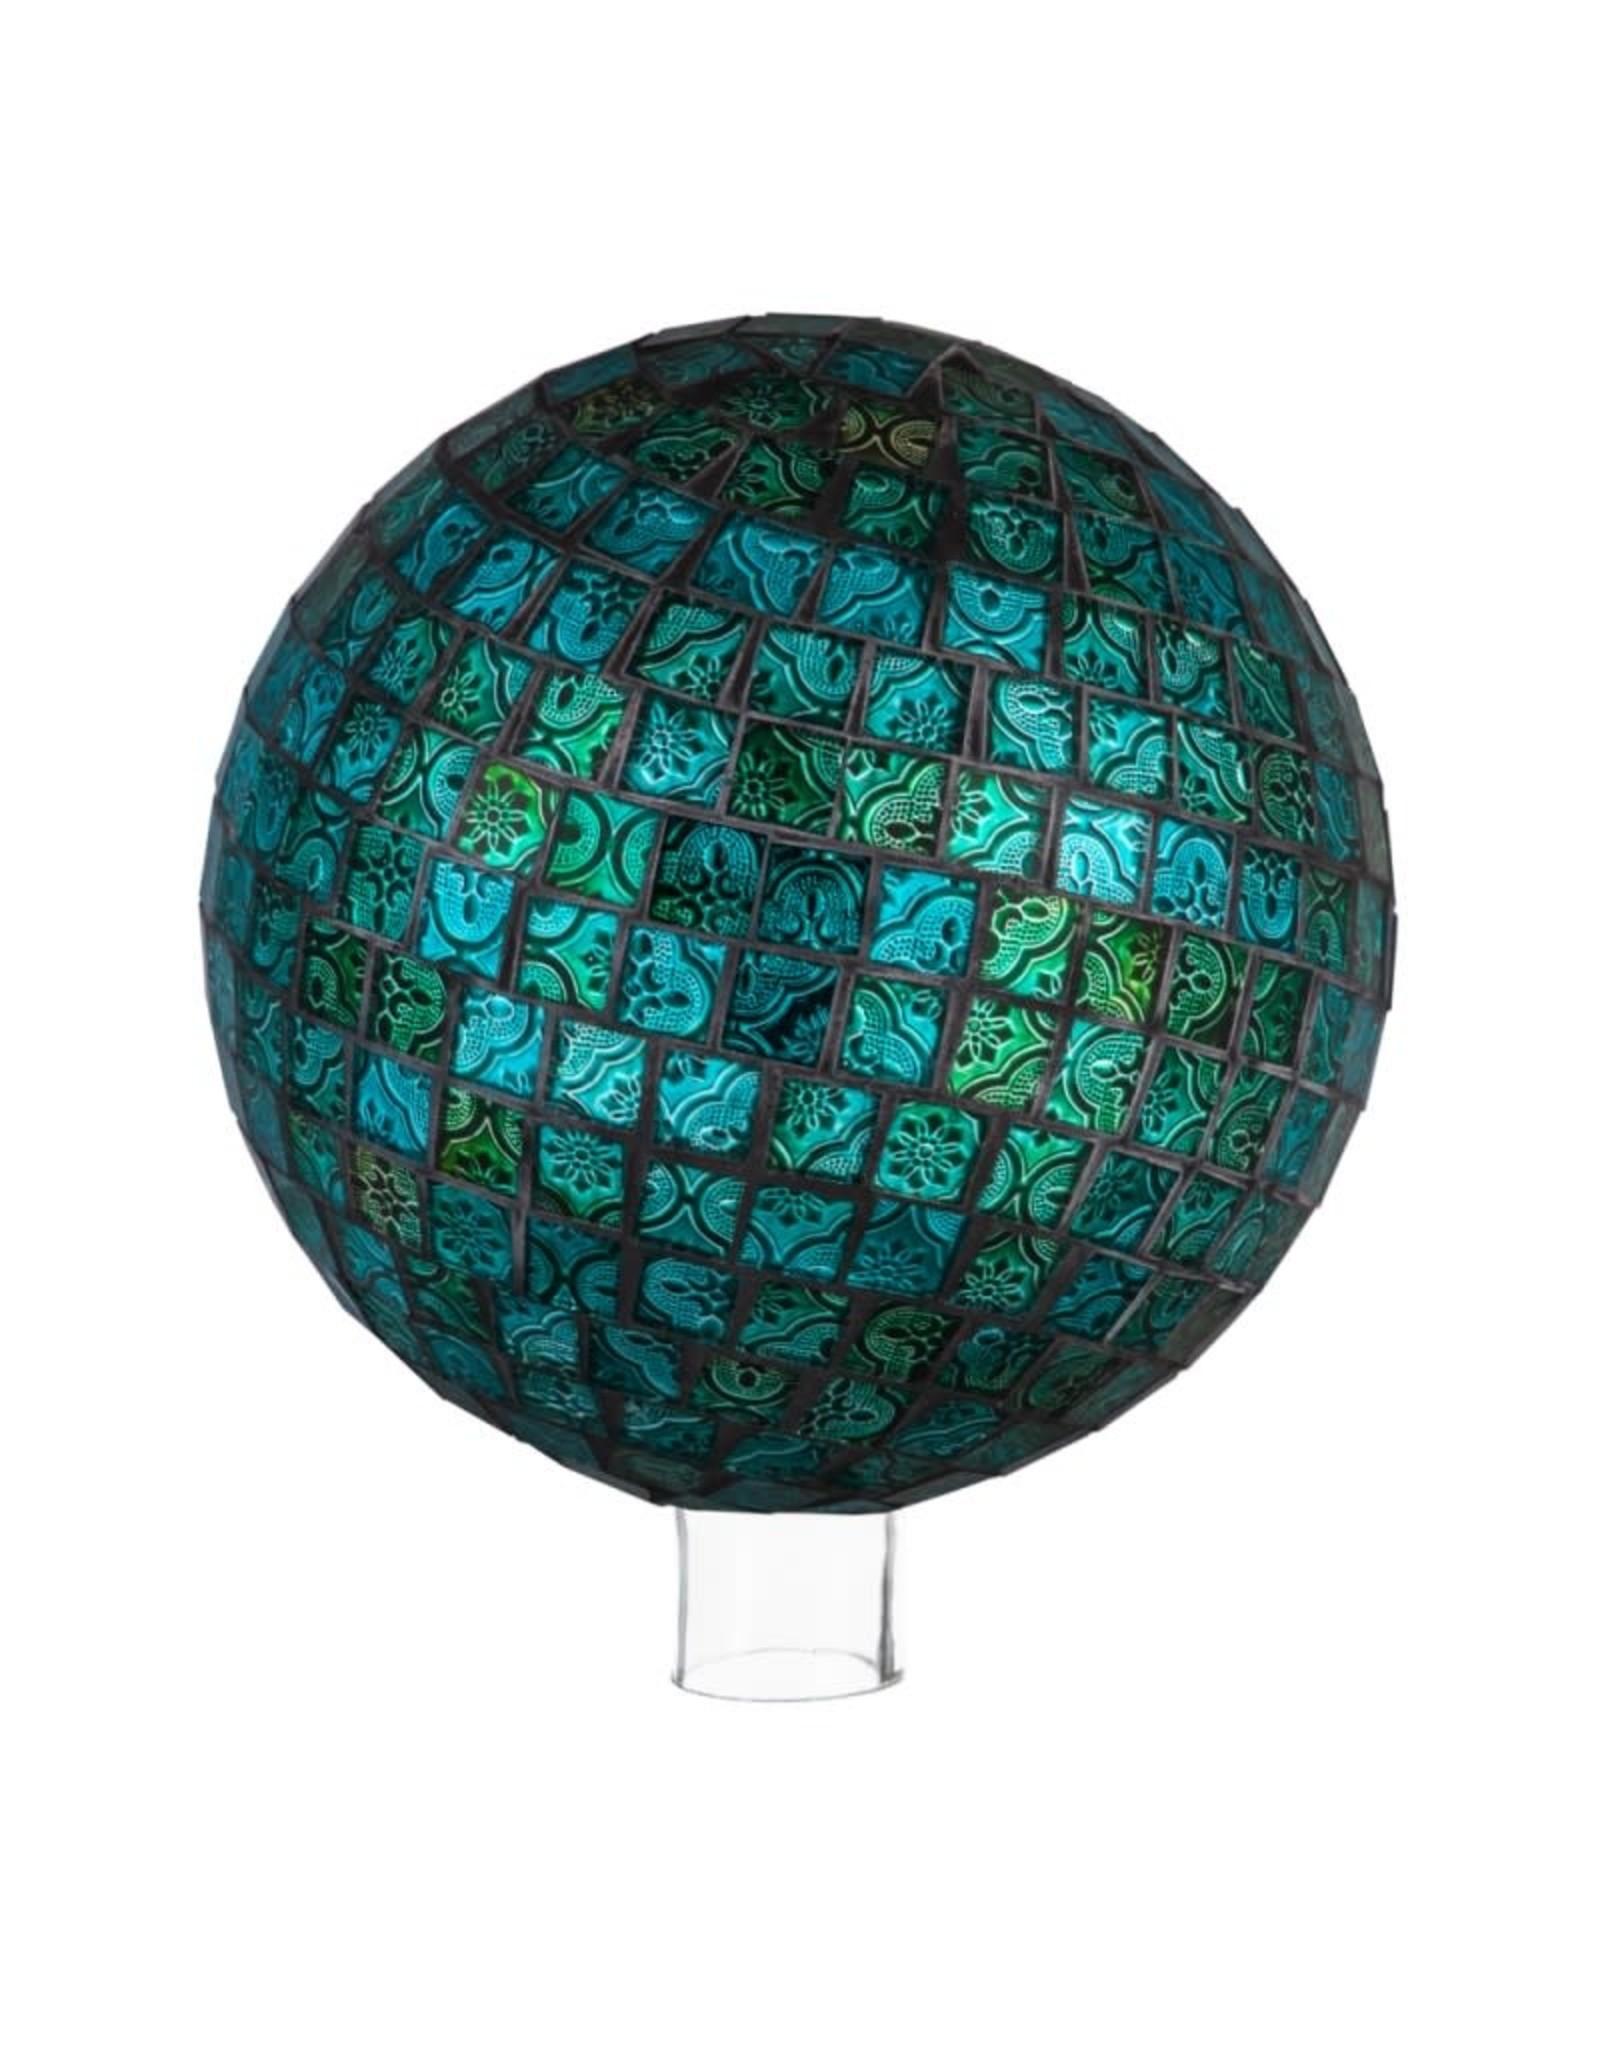 Gazing Ball - Turquoise Mosaic